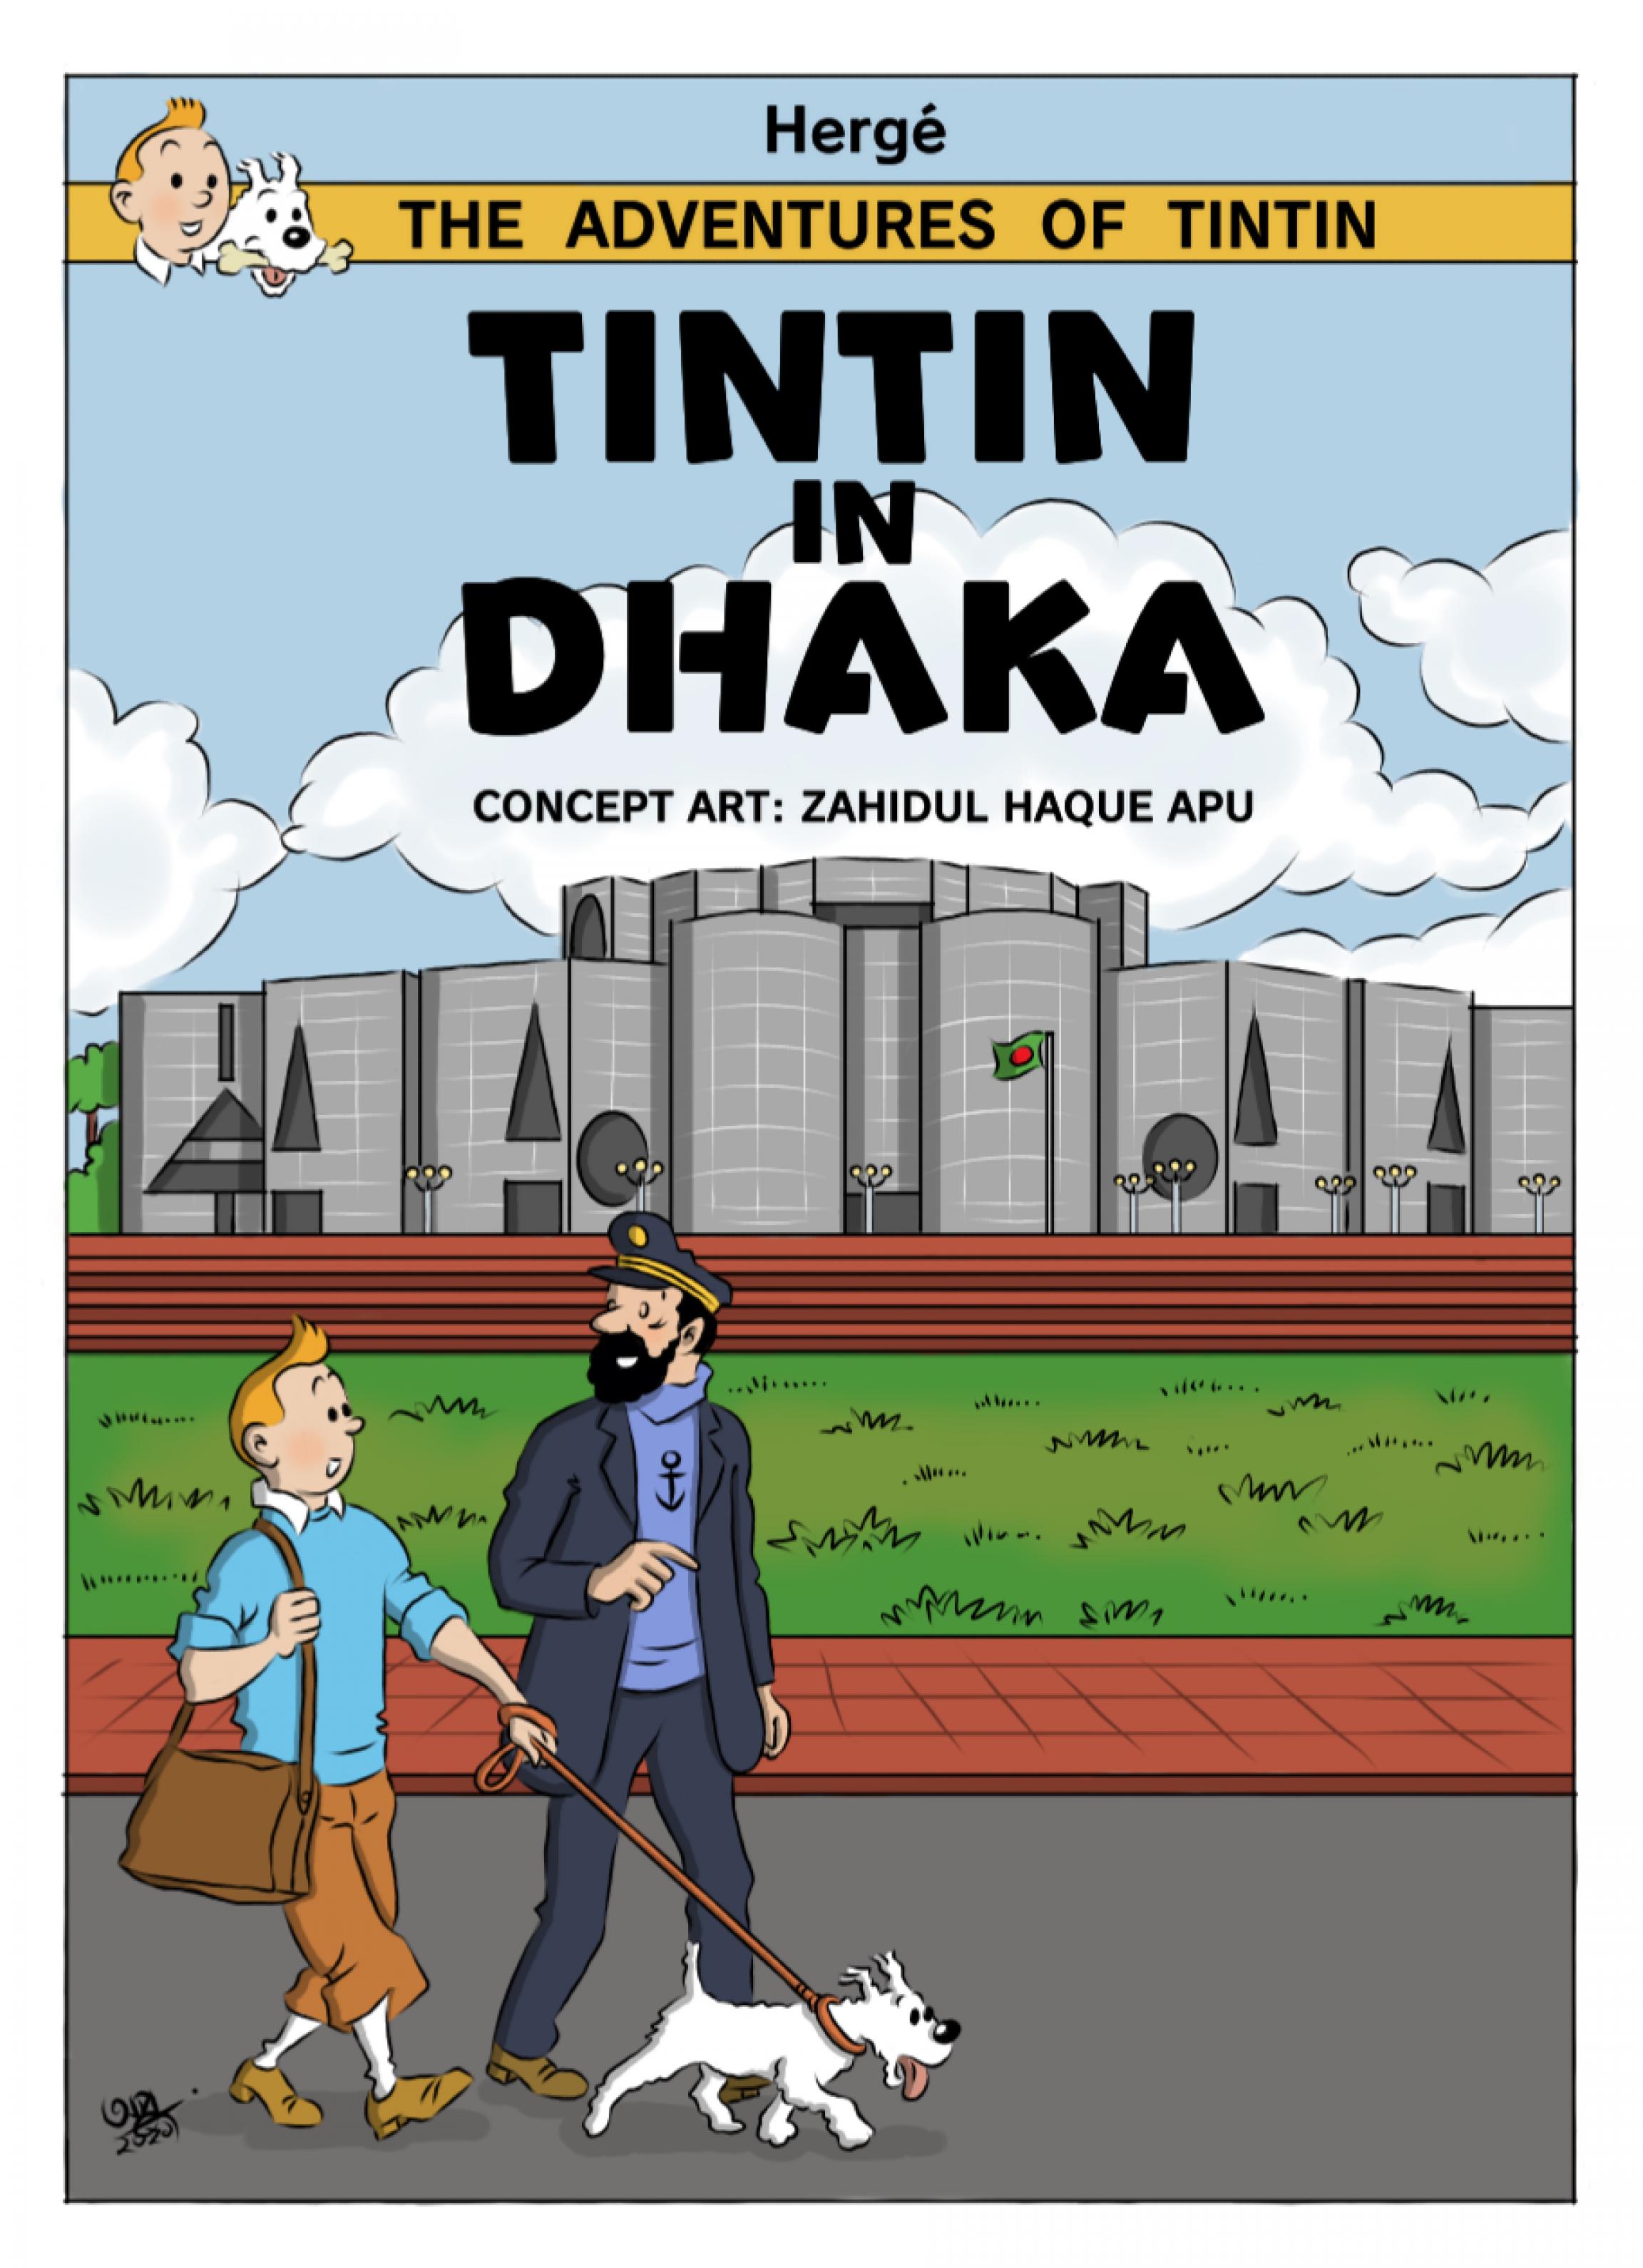 Cover art of character Tintin in Dhaka, Bangladesh